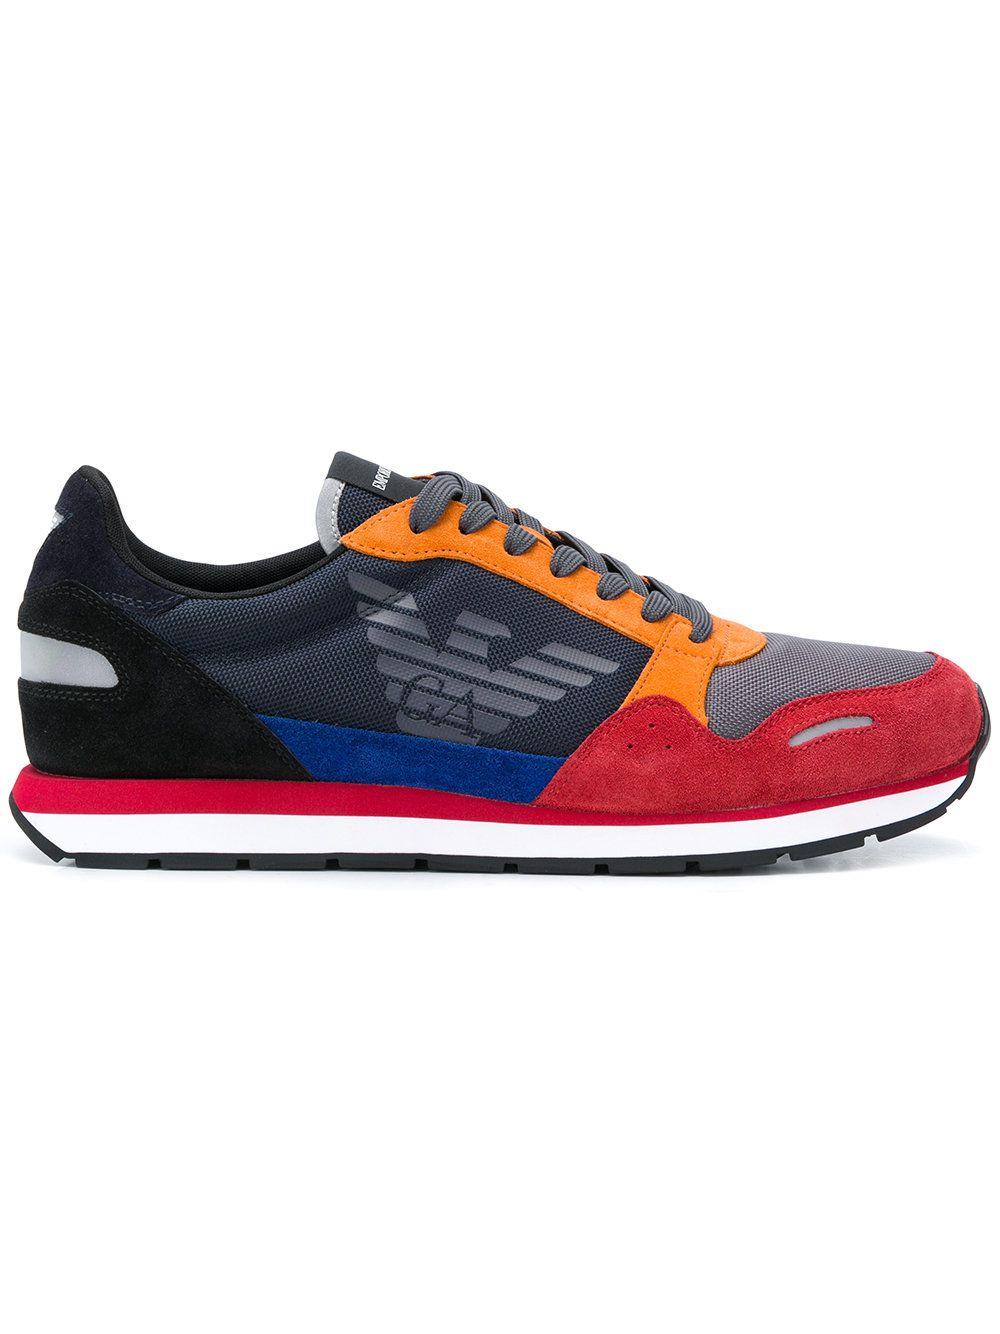 Emporio Armani Colour Block Sneakers Armani Sneakers Comfortable Sneakers